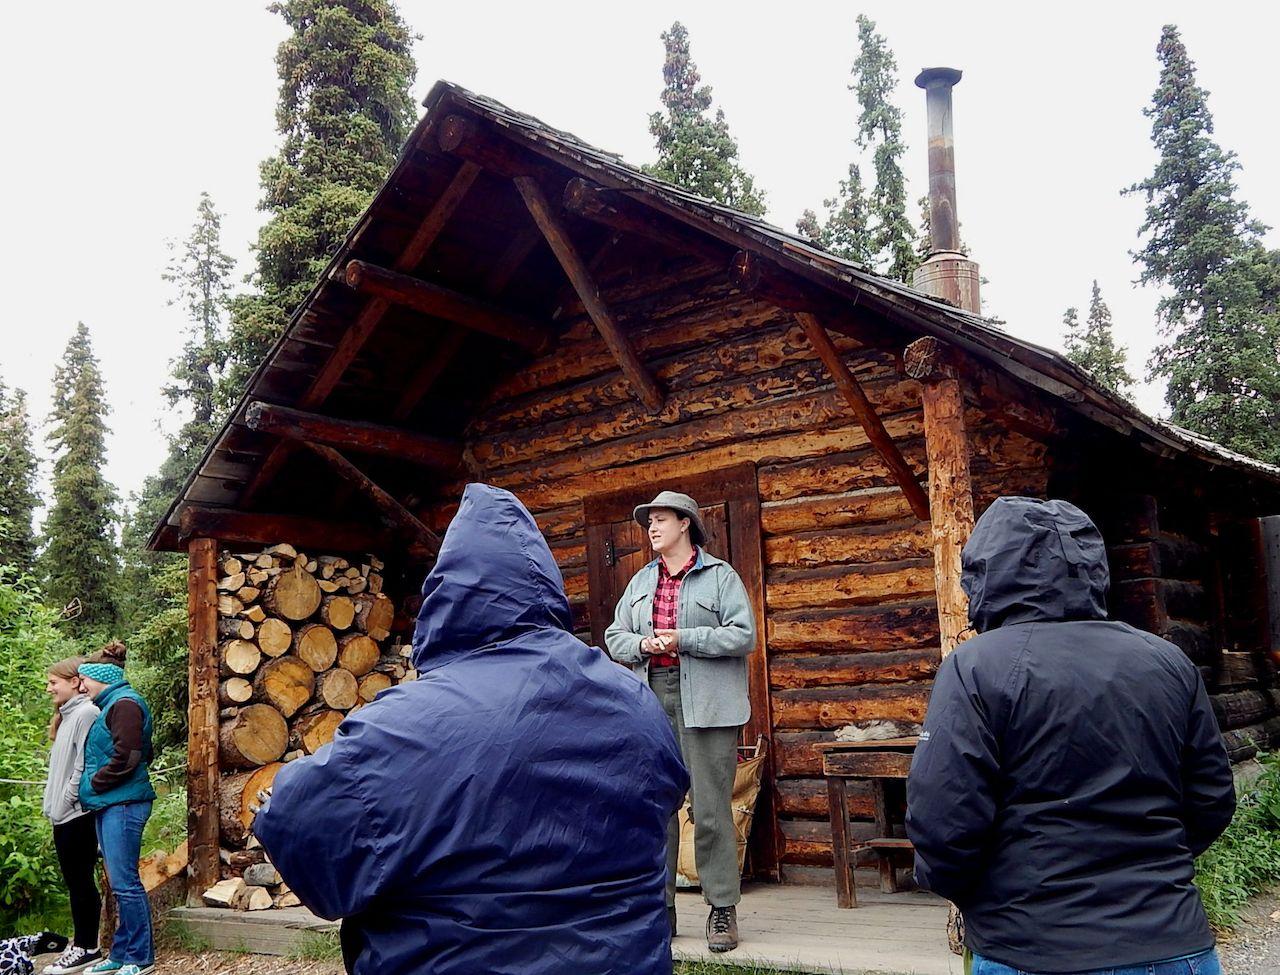 park ranger giving tourists a cabin tour at Denali National Park